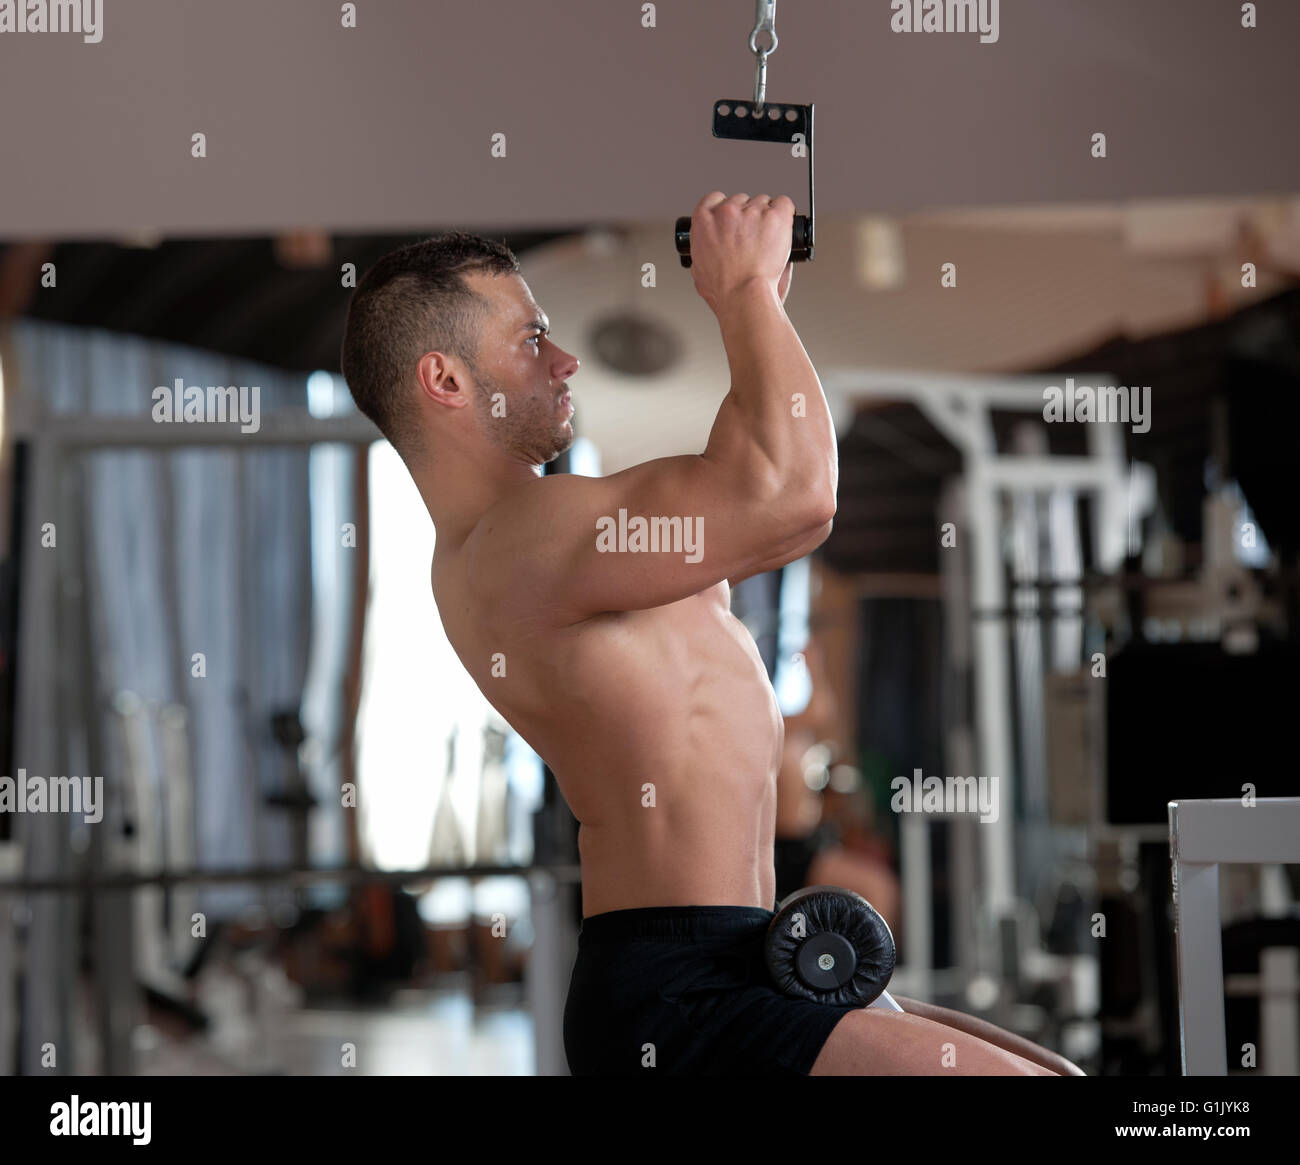 Apuesto joven hombre muscular en un gimnasio Imagen De Stock